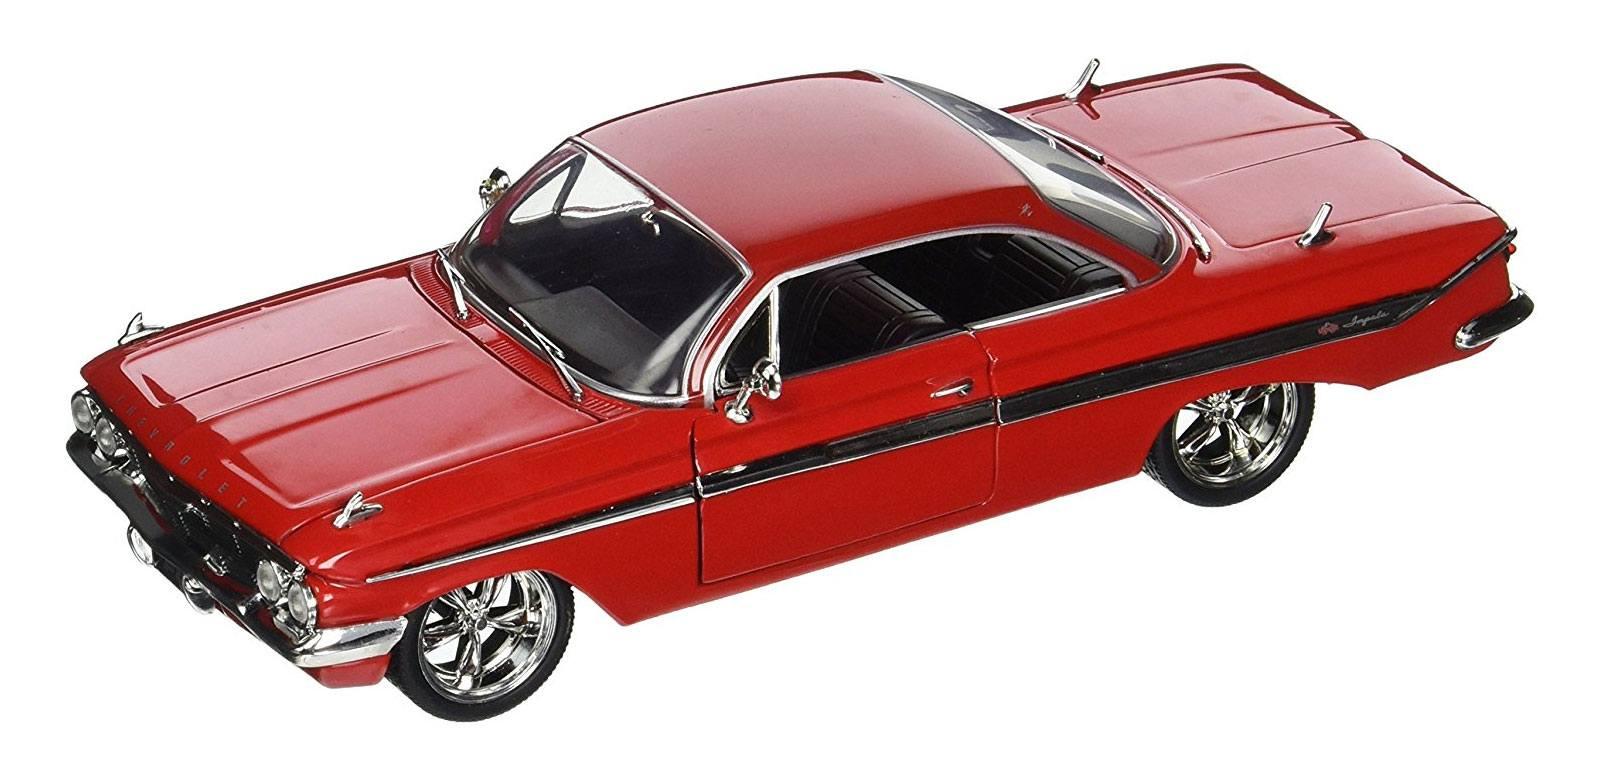 Fast & Furious 8 Diecast Model 1/24 Dom's Chevy Impala